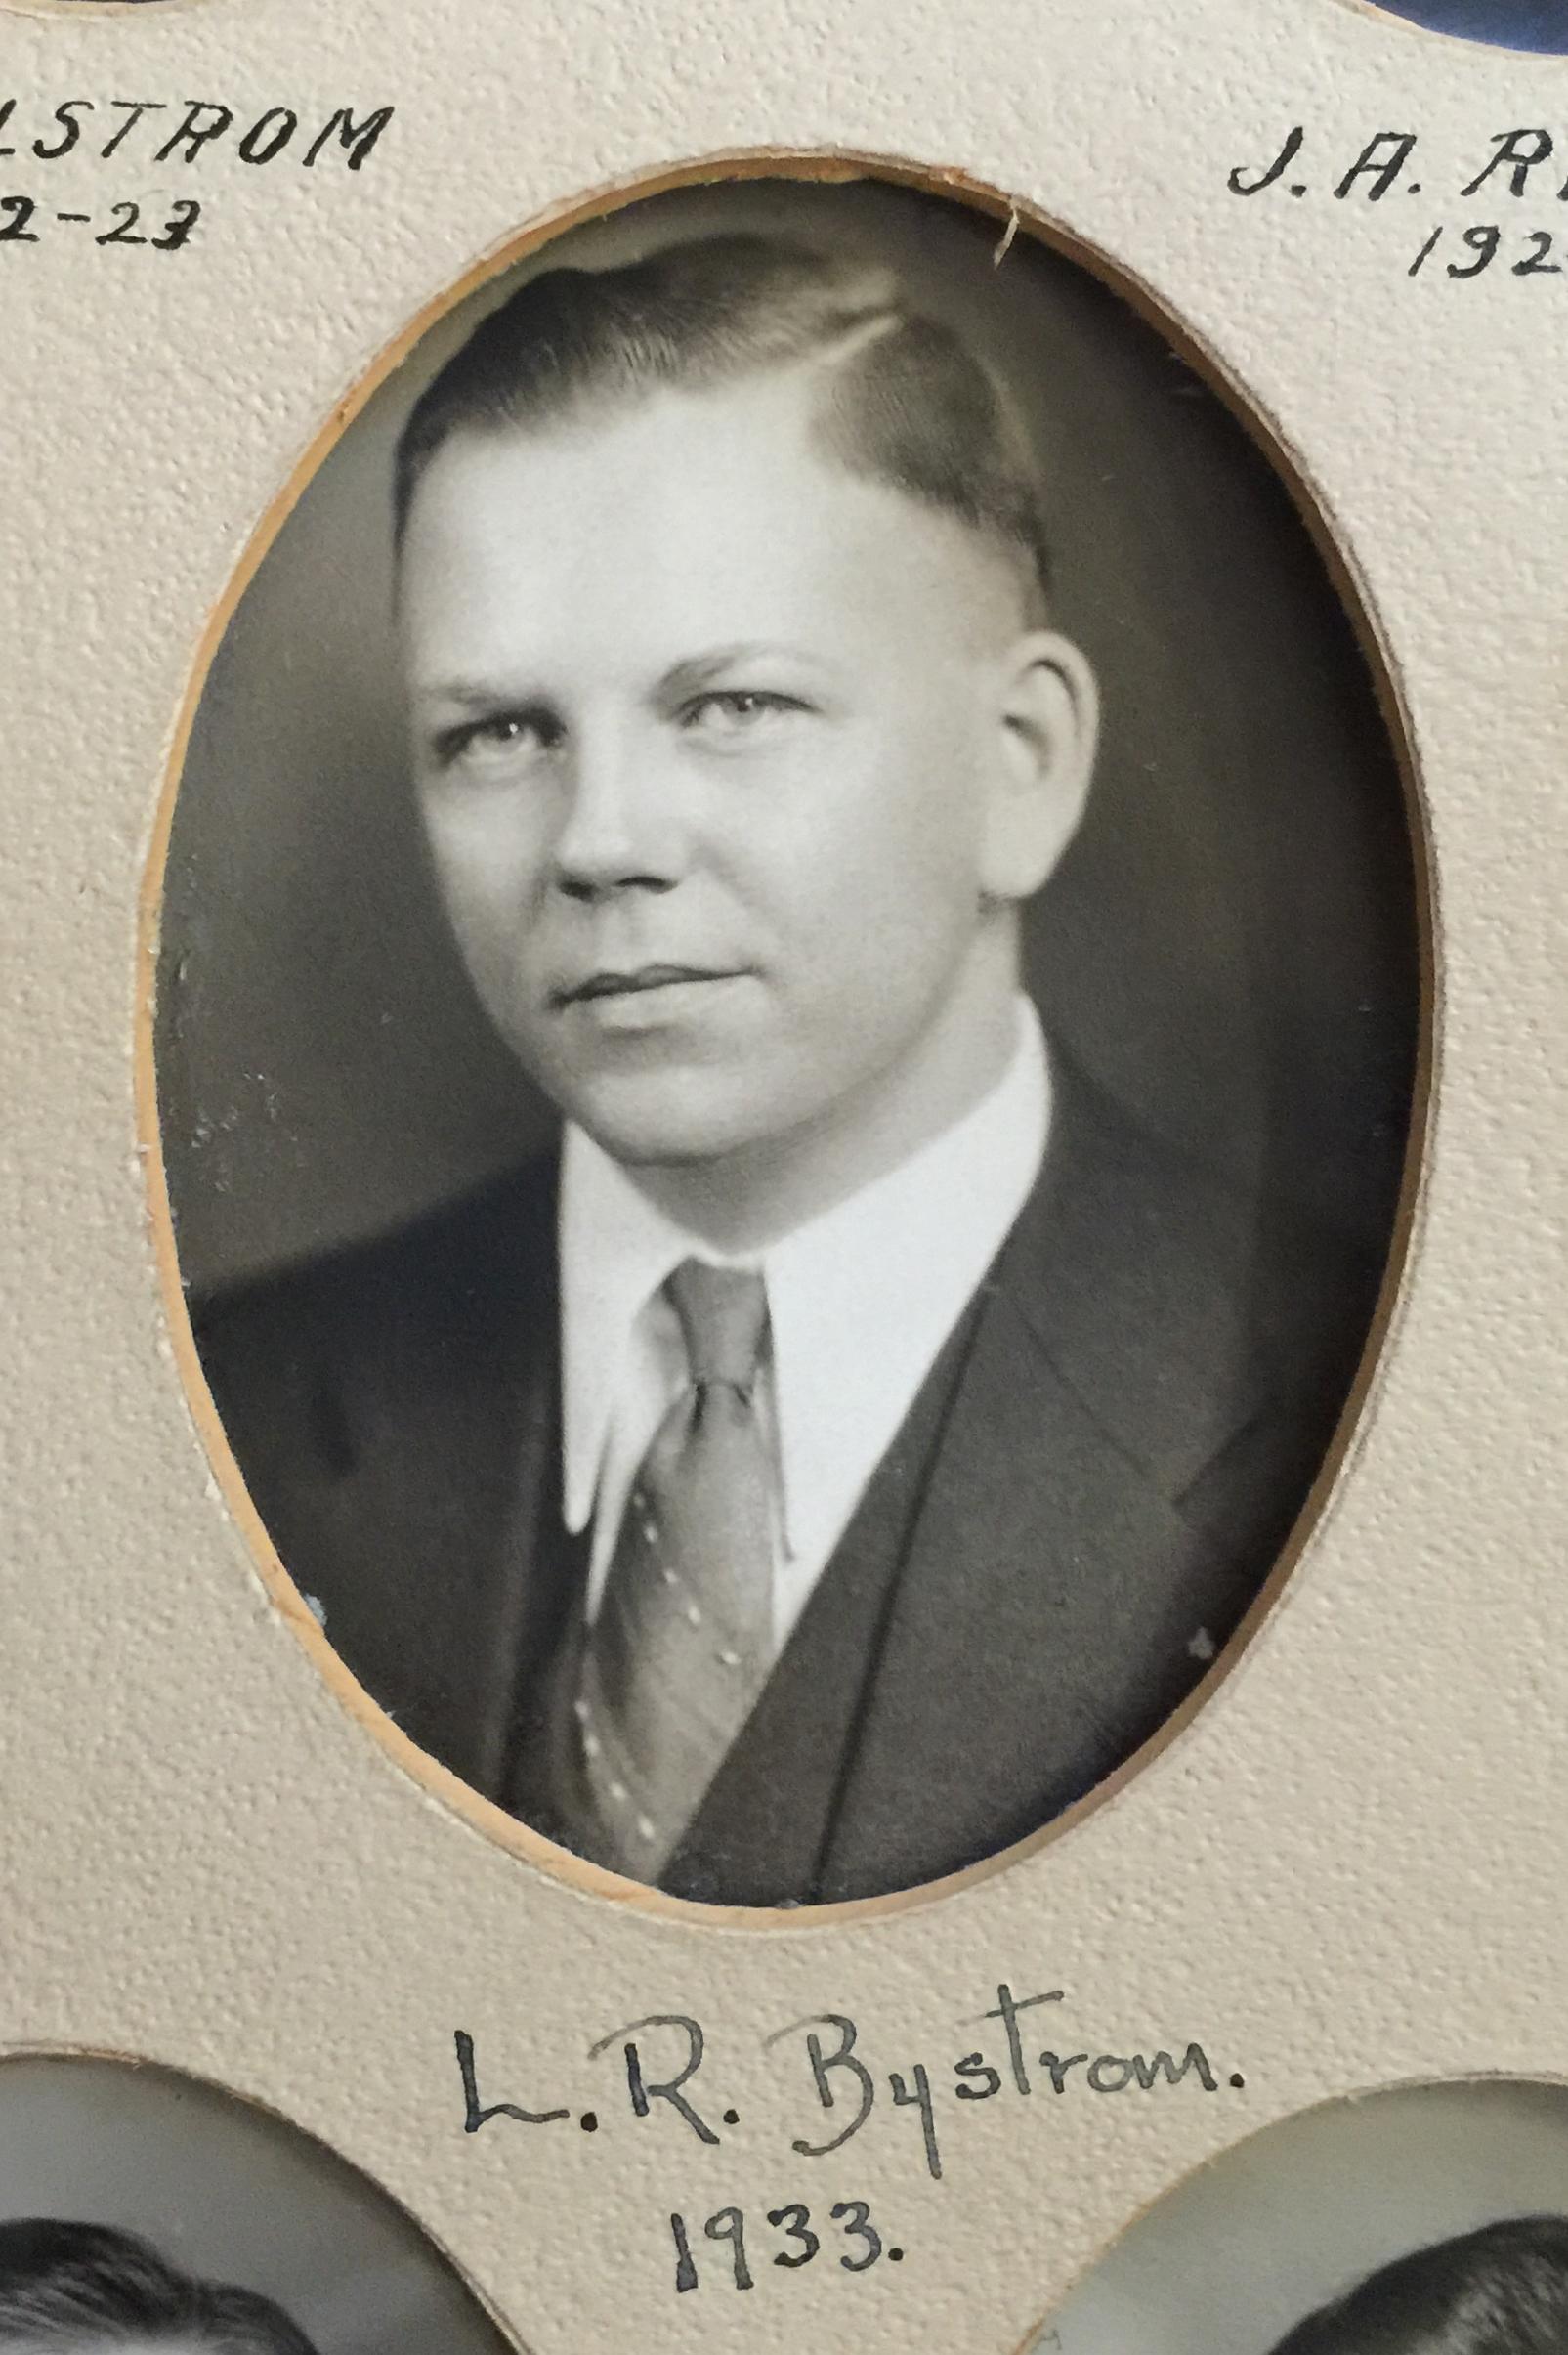 1933 L.R. Bystrom